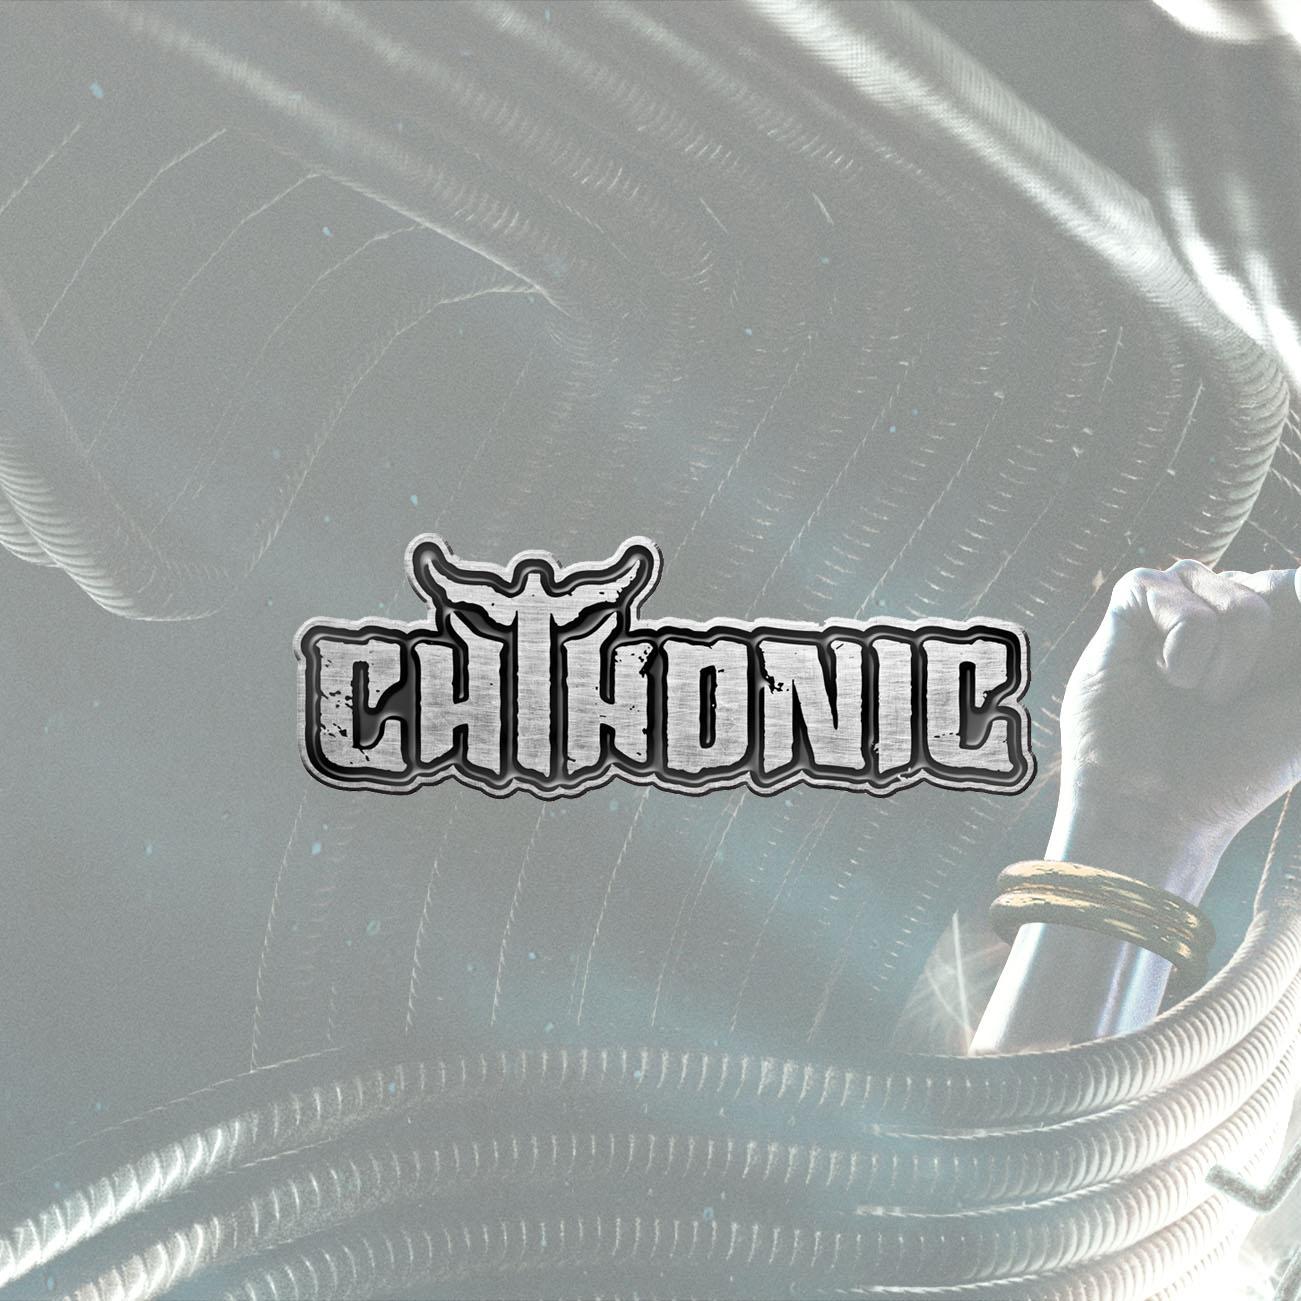 CHTHONIC - 'Logo' Metal Pin Badge - CHTHONIC